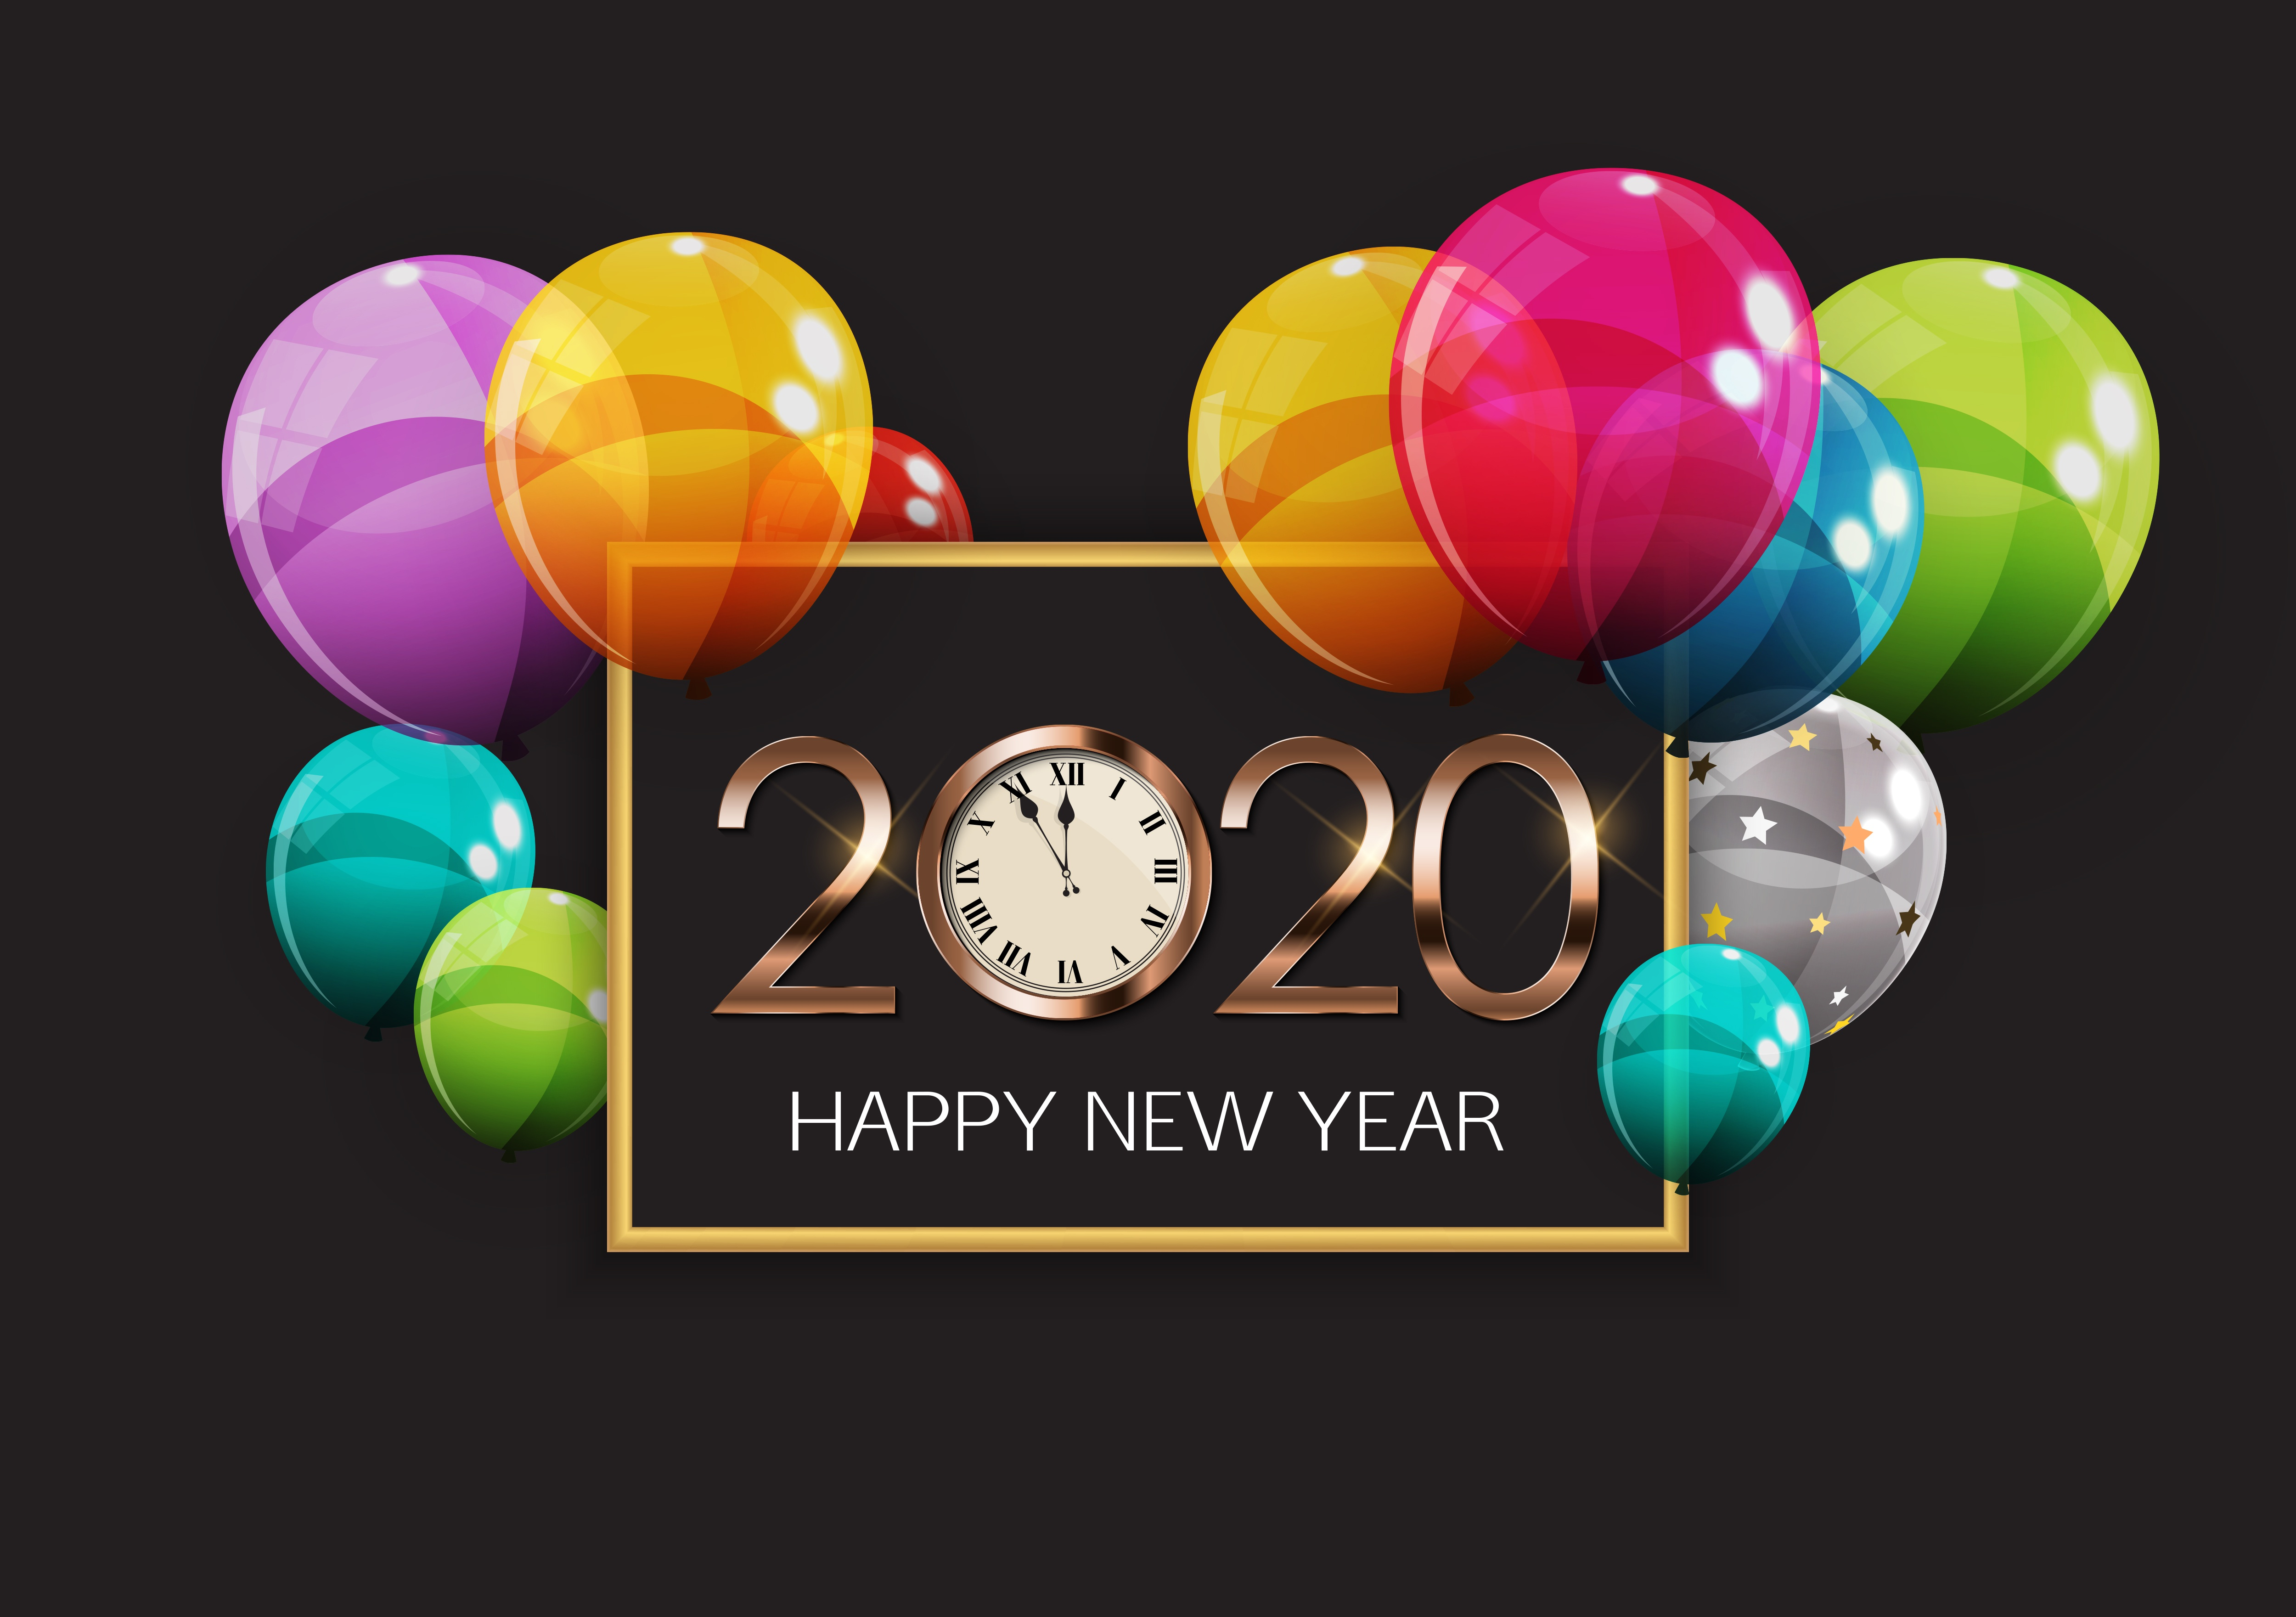 New Year 2020 4k Ultra HD Wallpaper Background Image 5000x3521 5000x3521